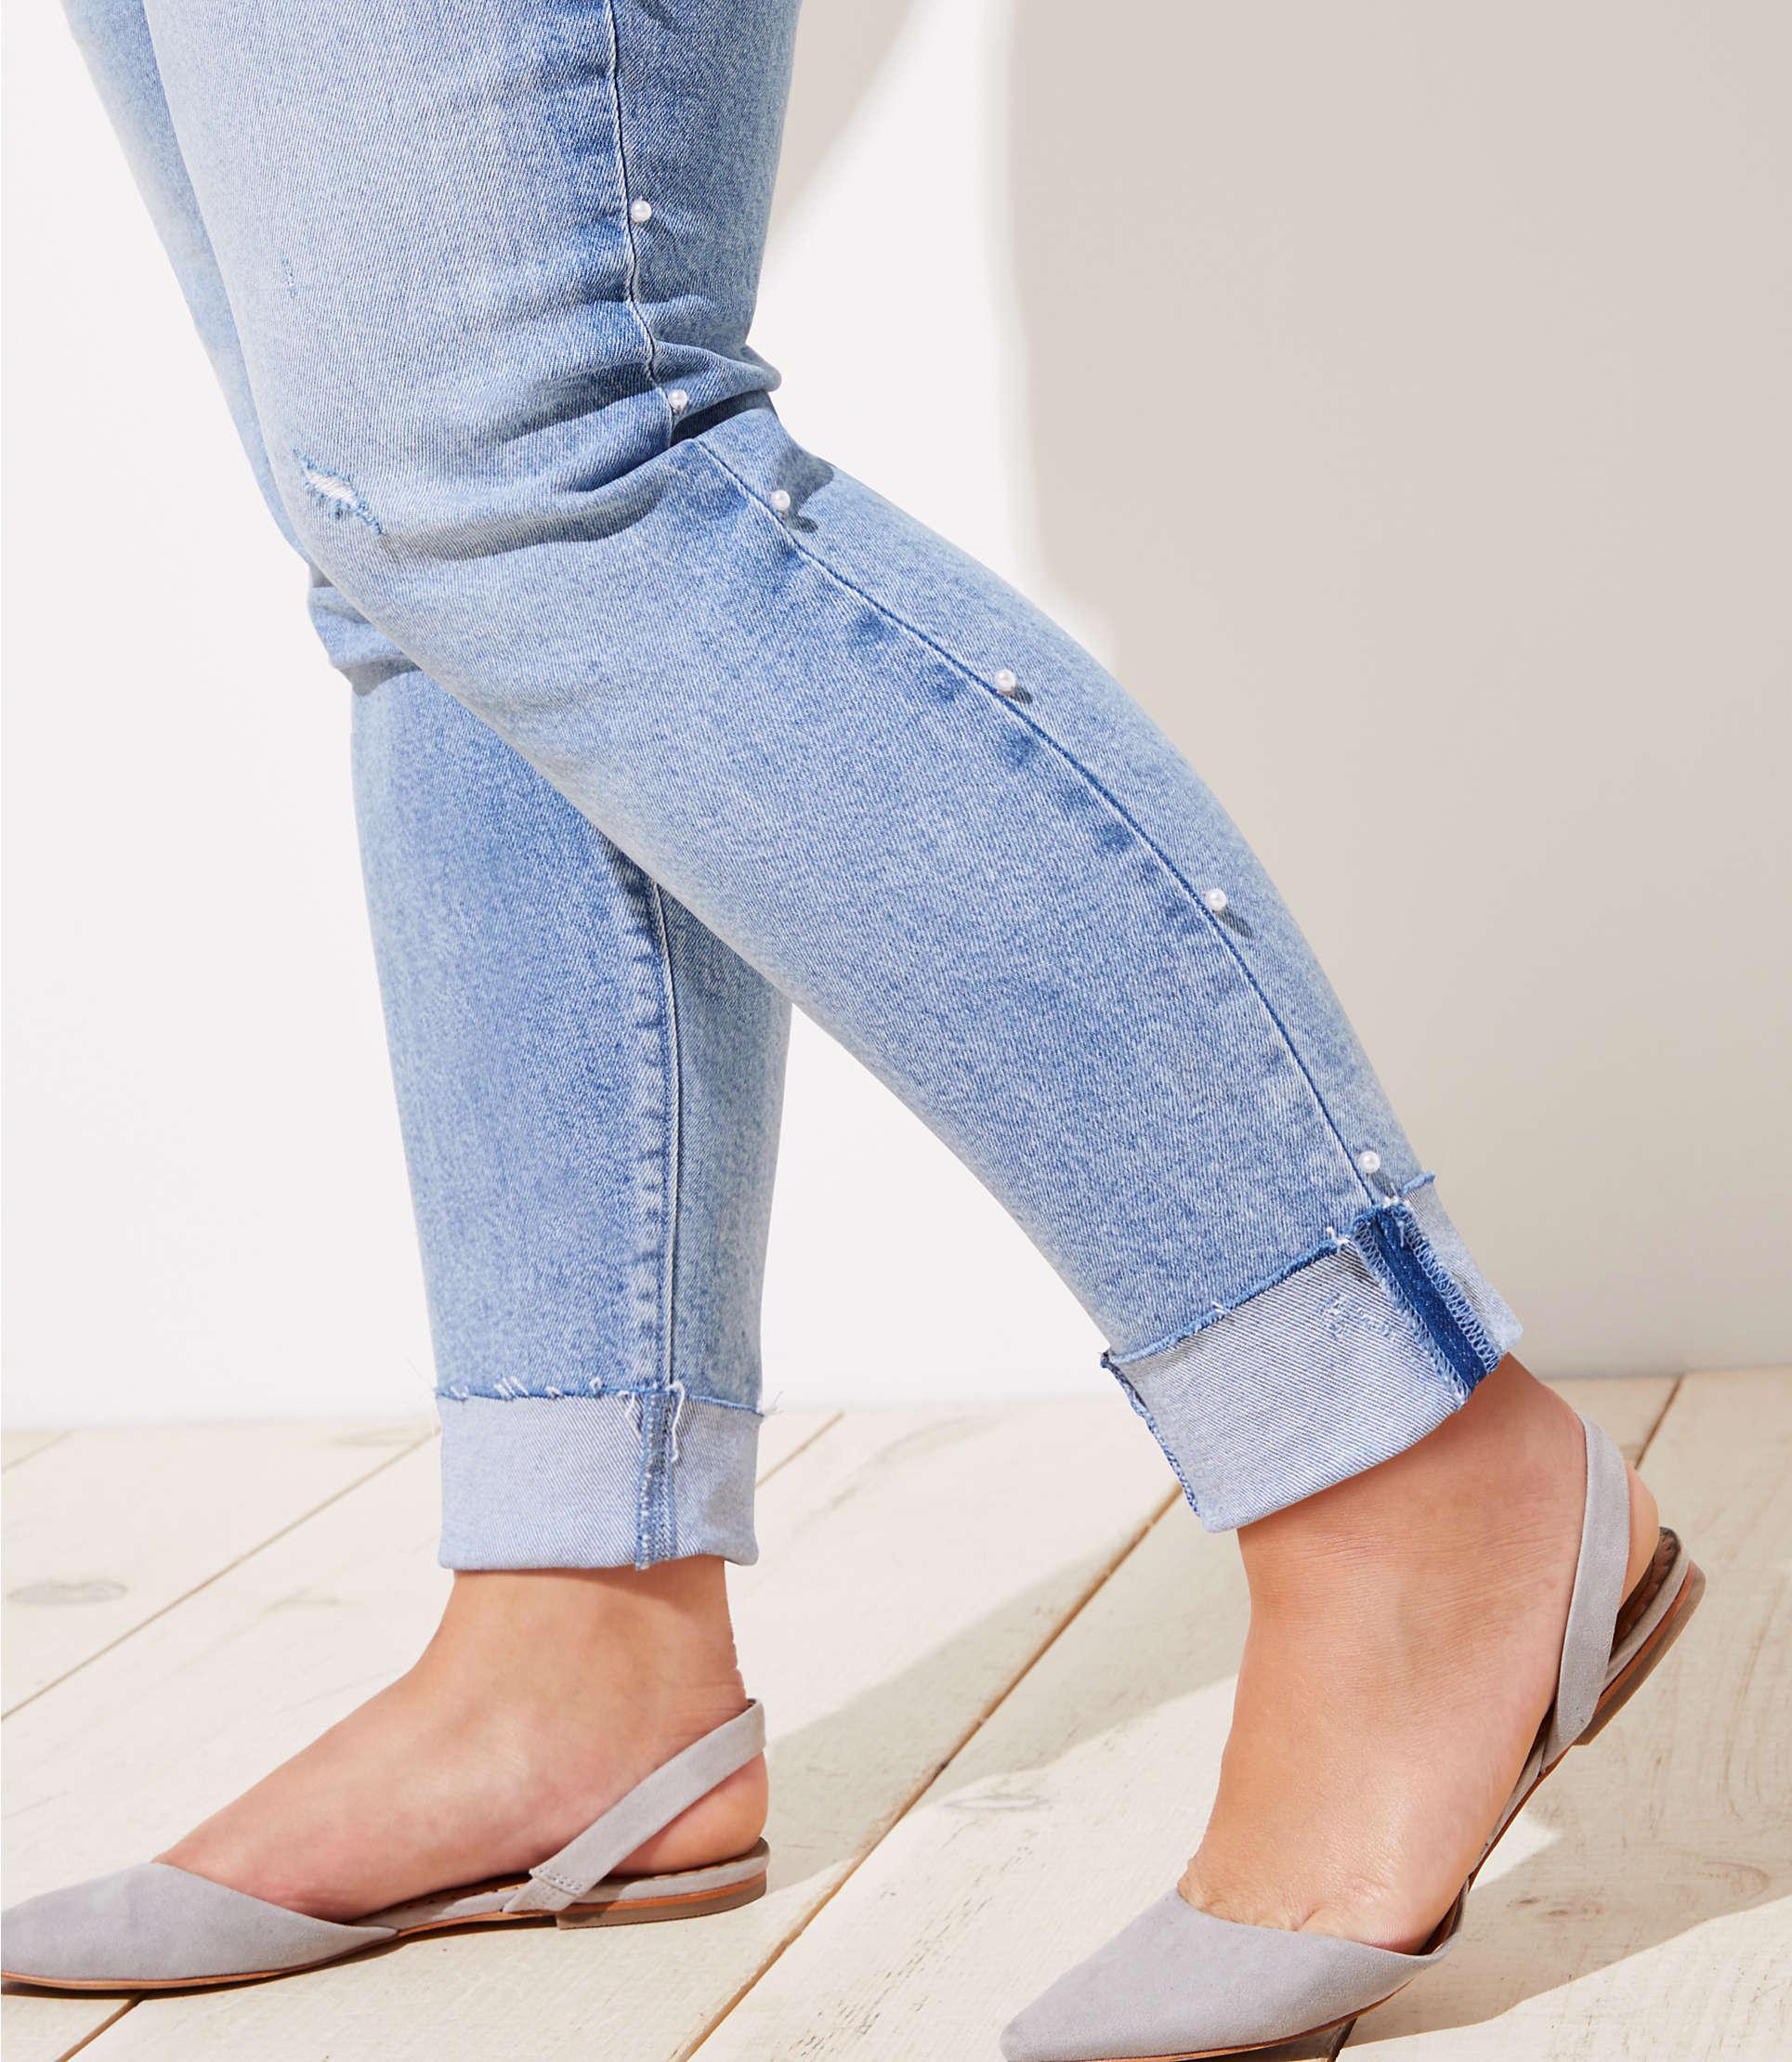 27961826b59bc LOFT - Blue Plus Pearlized Trim Flip Cuff Skinny Jeans In Staple Light  Indigo Wash -. View fullscreen